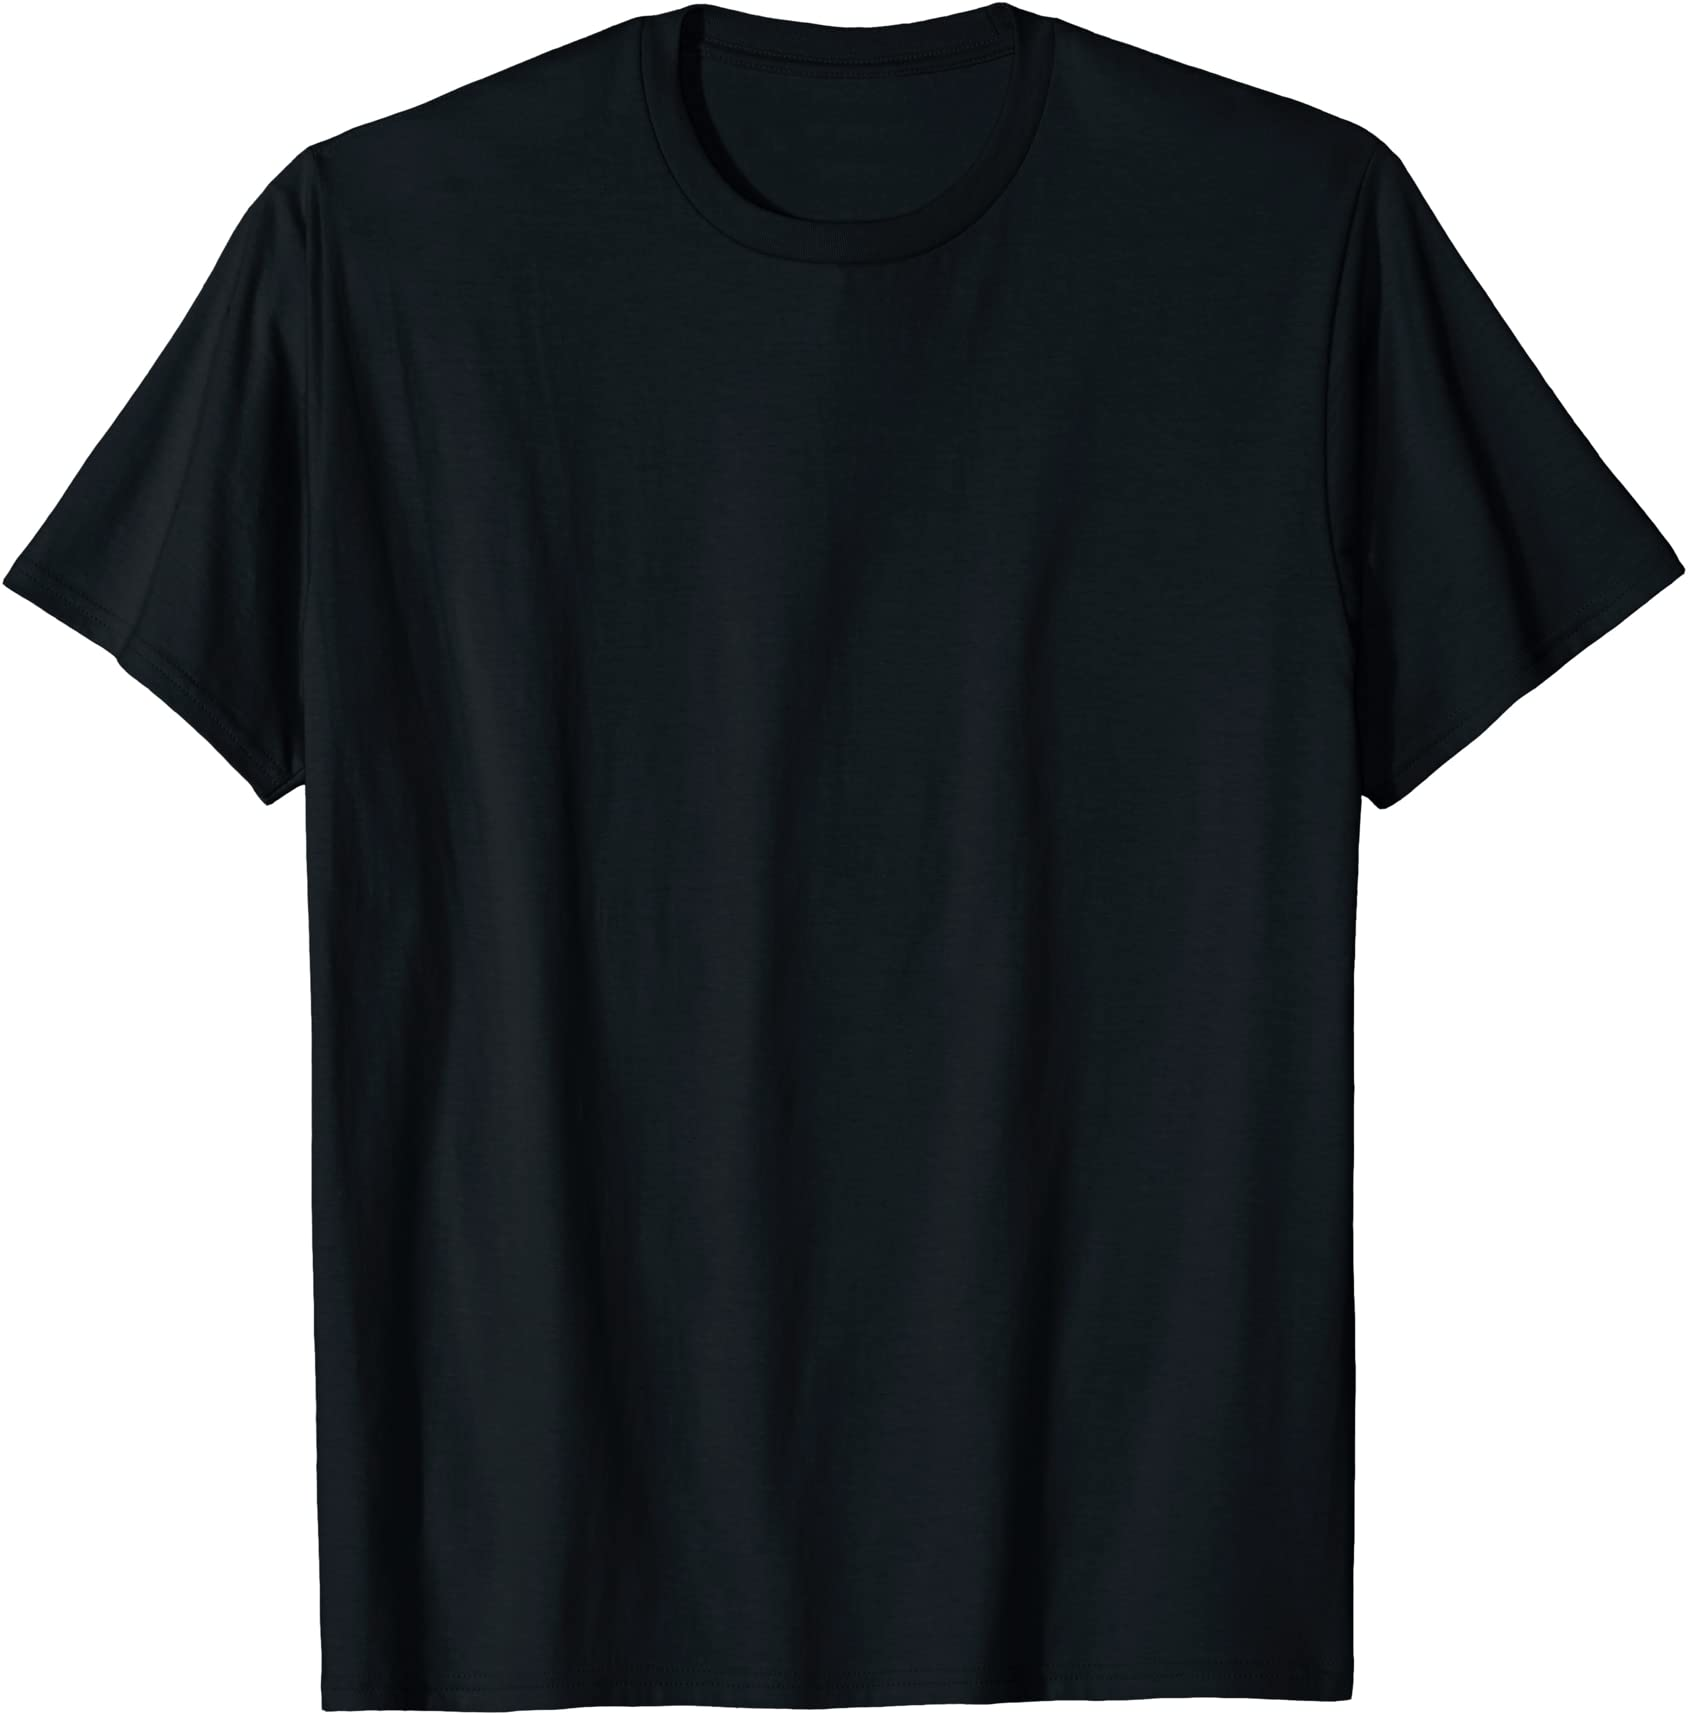 Star Wars AT-AT Constellation Black Men/'s T-Shirt New